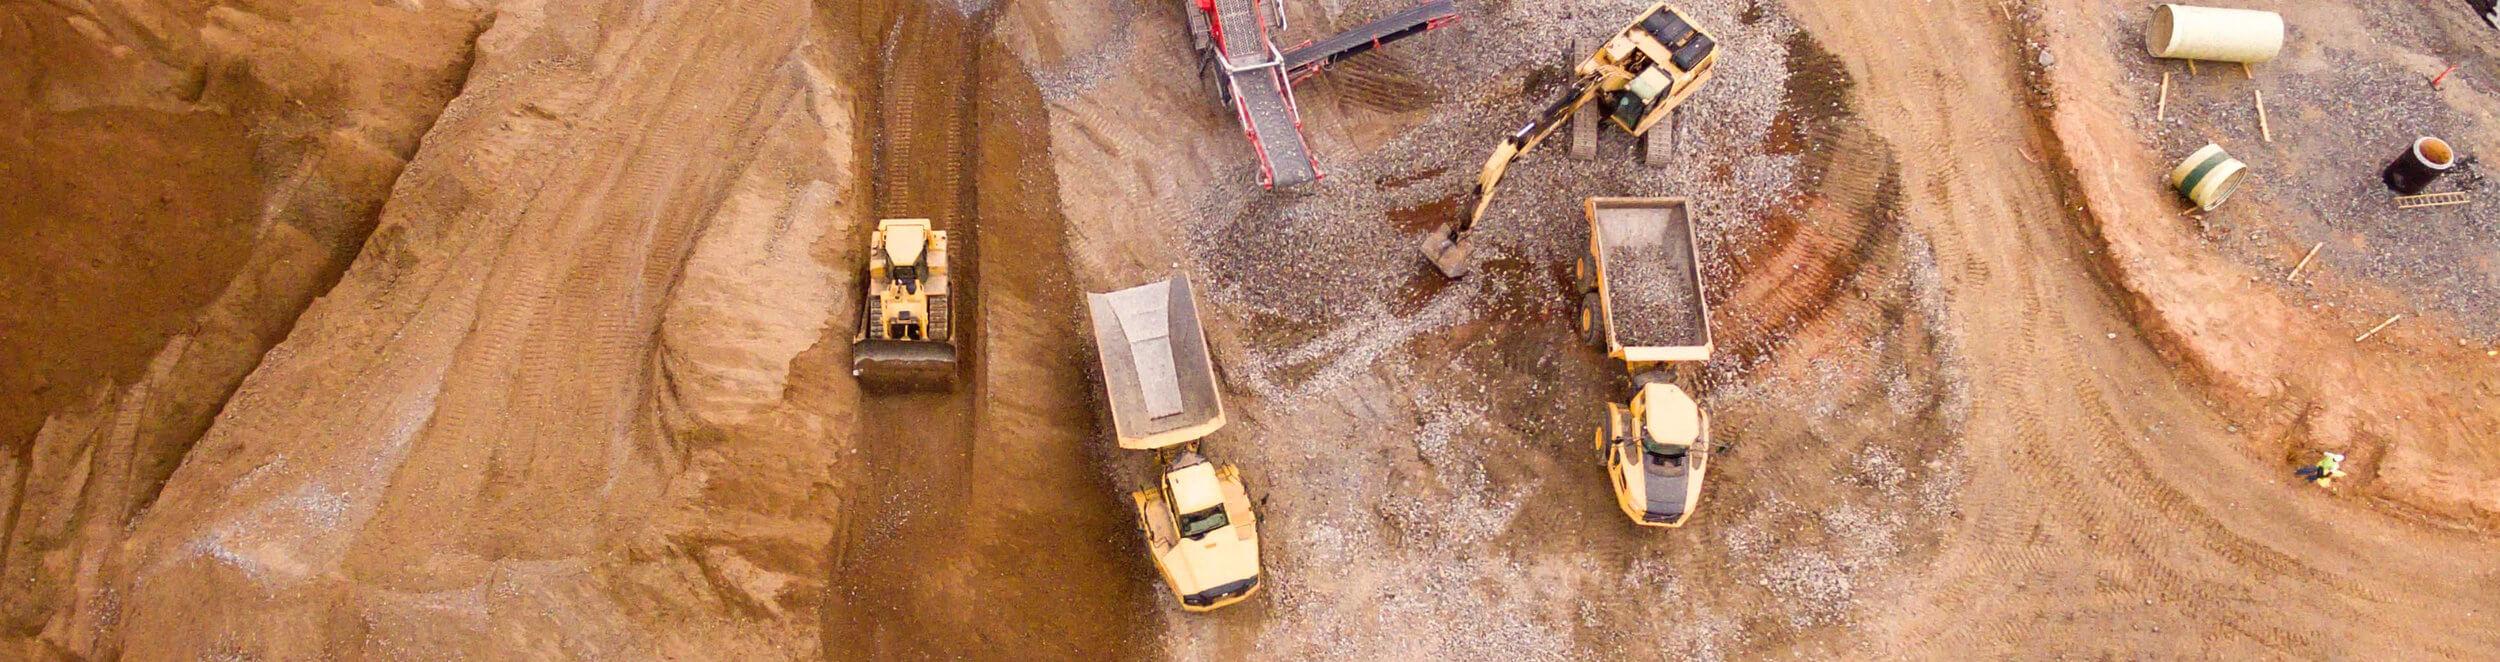 Quarry with excavators and dump trucks